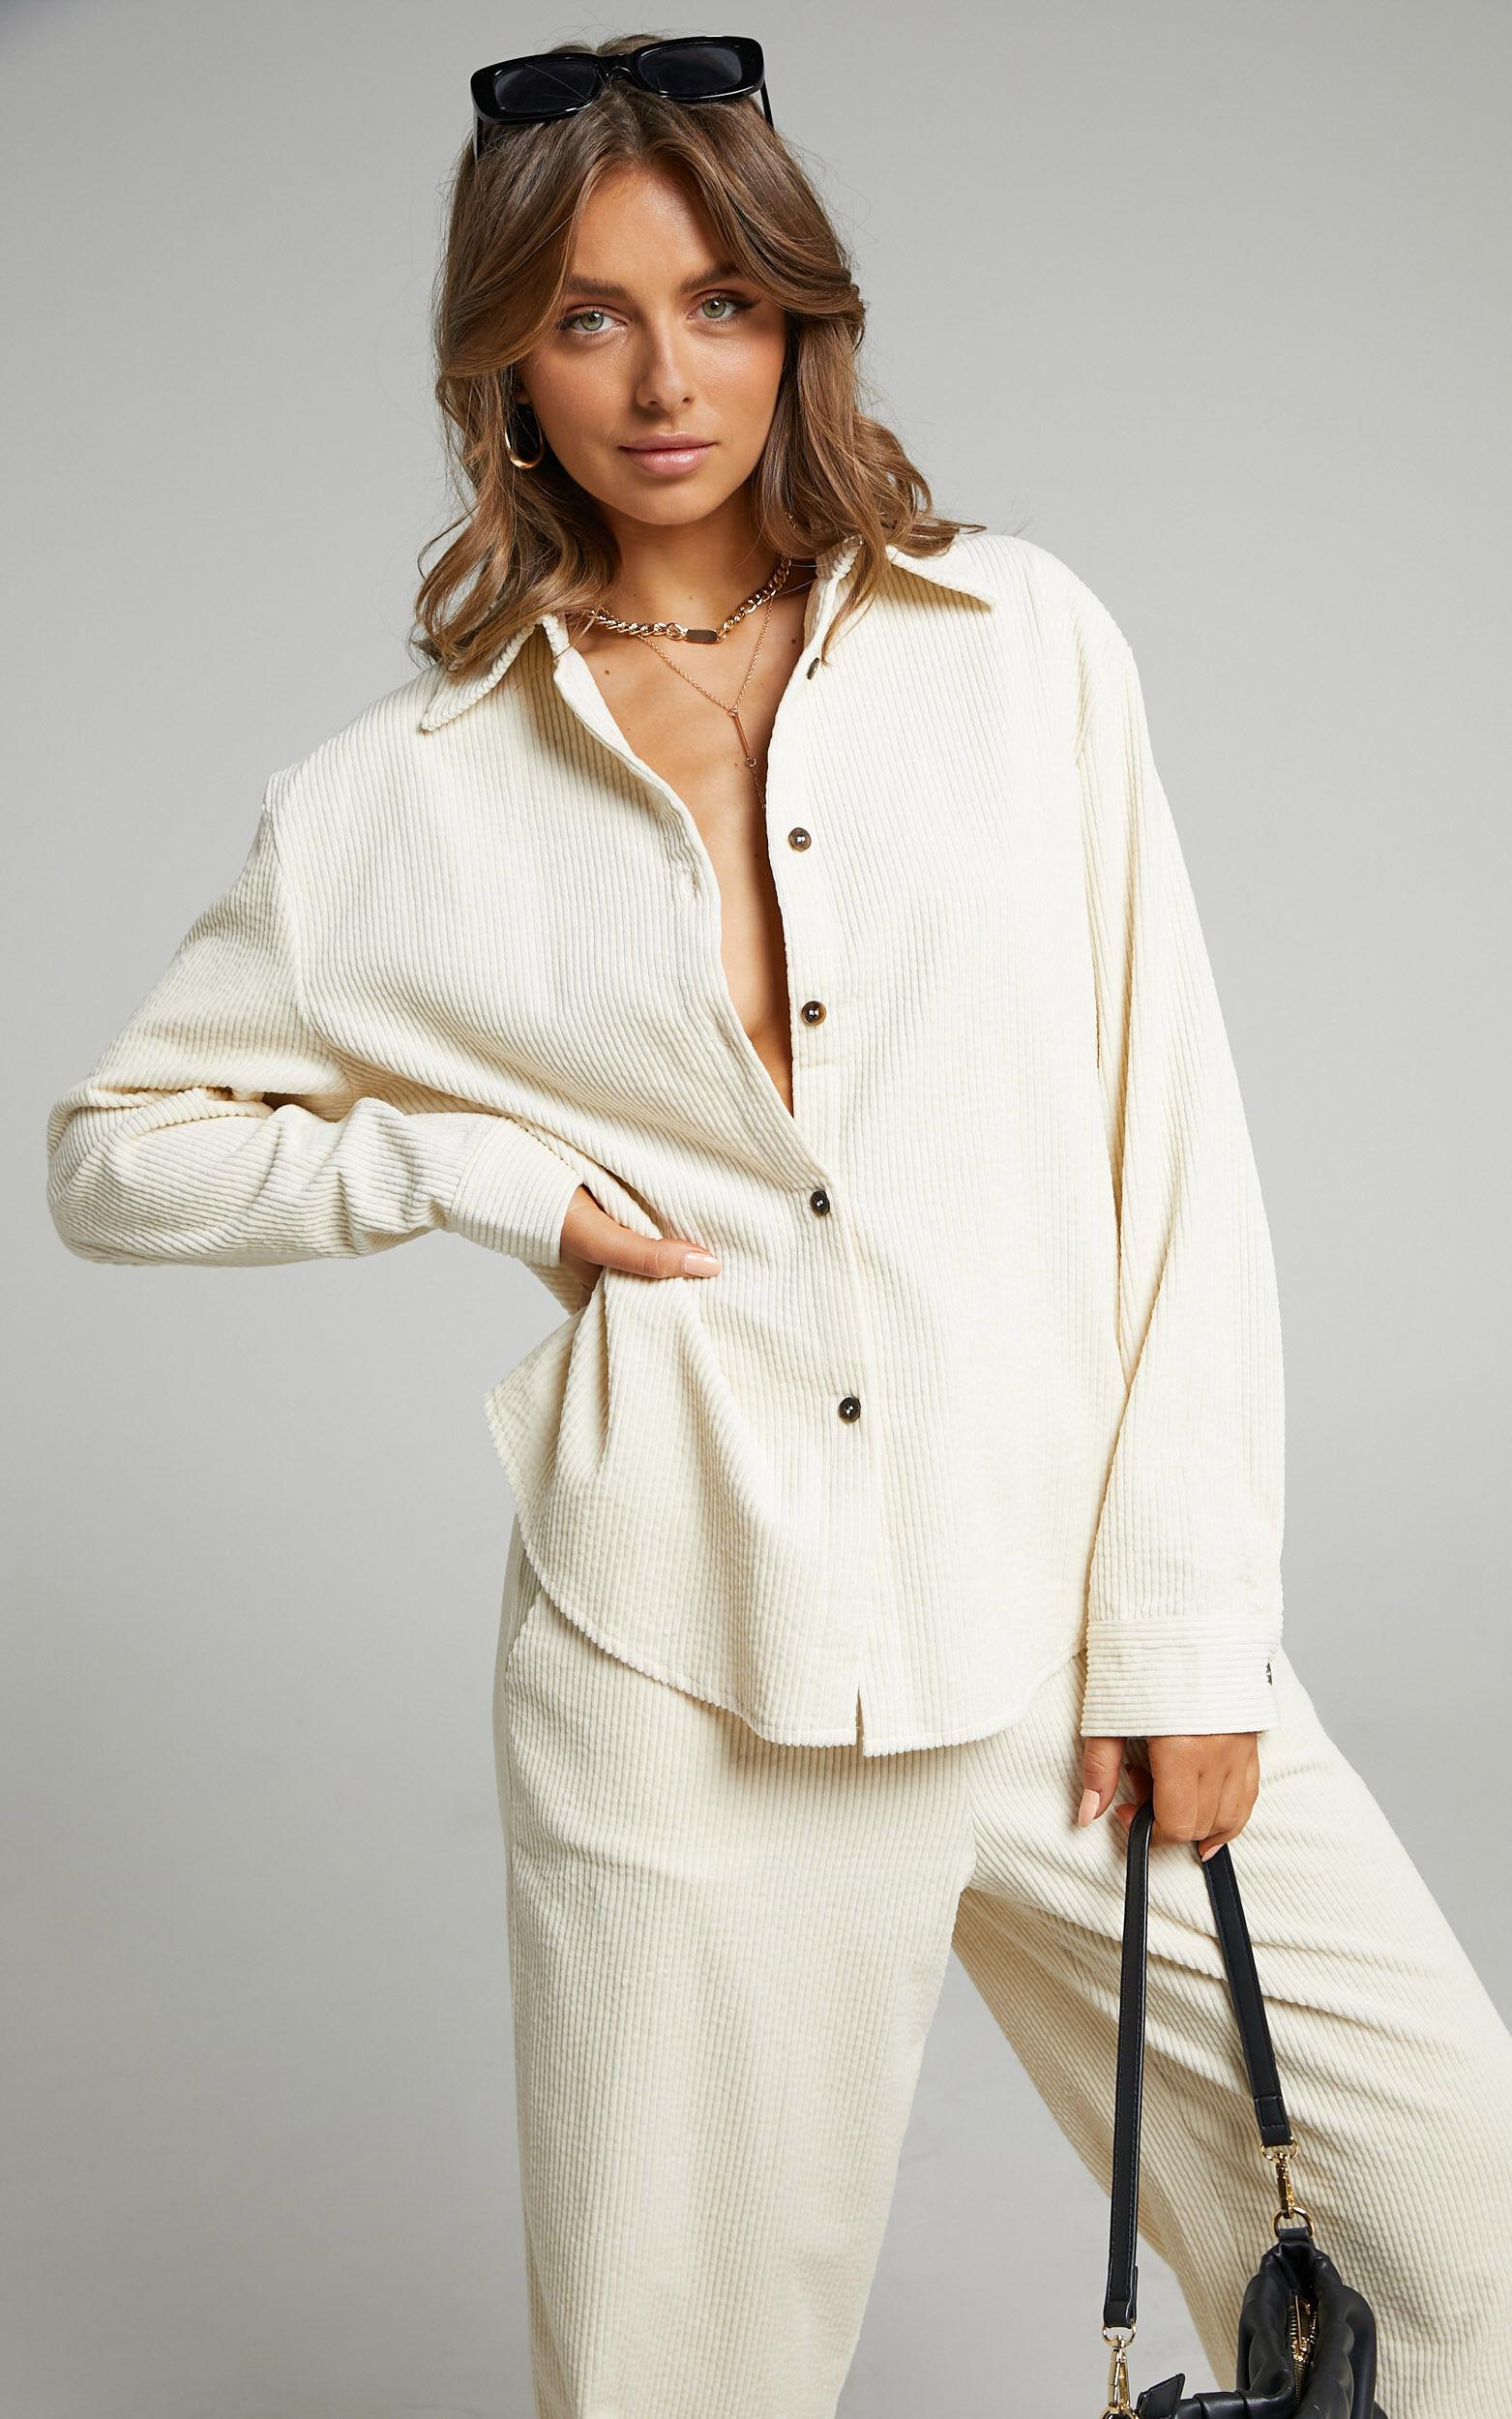 Lioness - Nikita Cord Shirt in Cream - L, CRE1, super-hi-res image number null